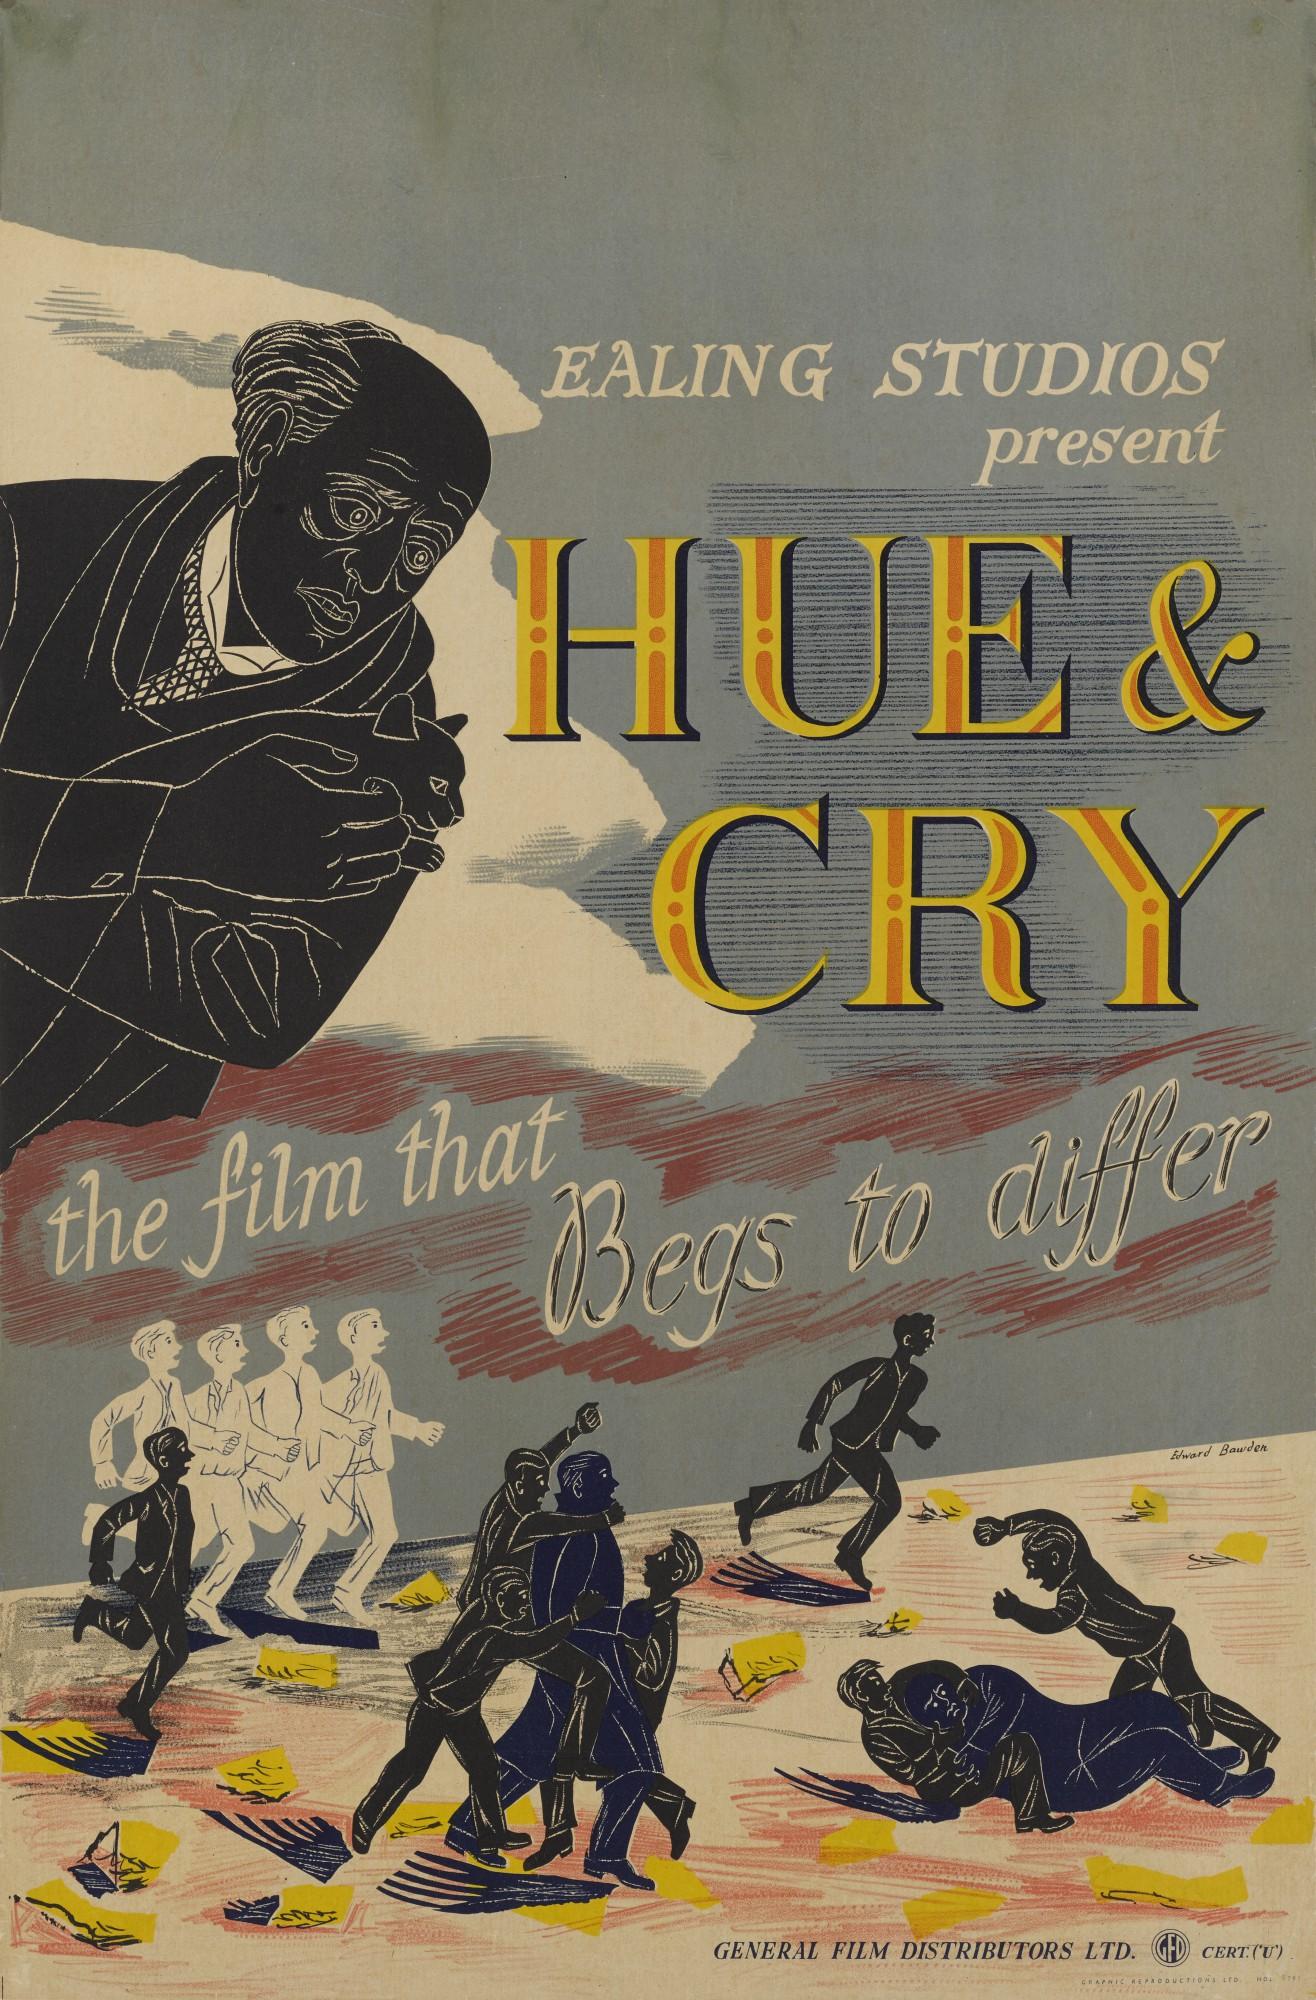 HUE AND CRY (1947) POSTER, BRITISH